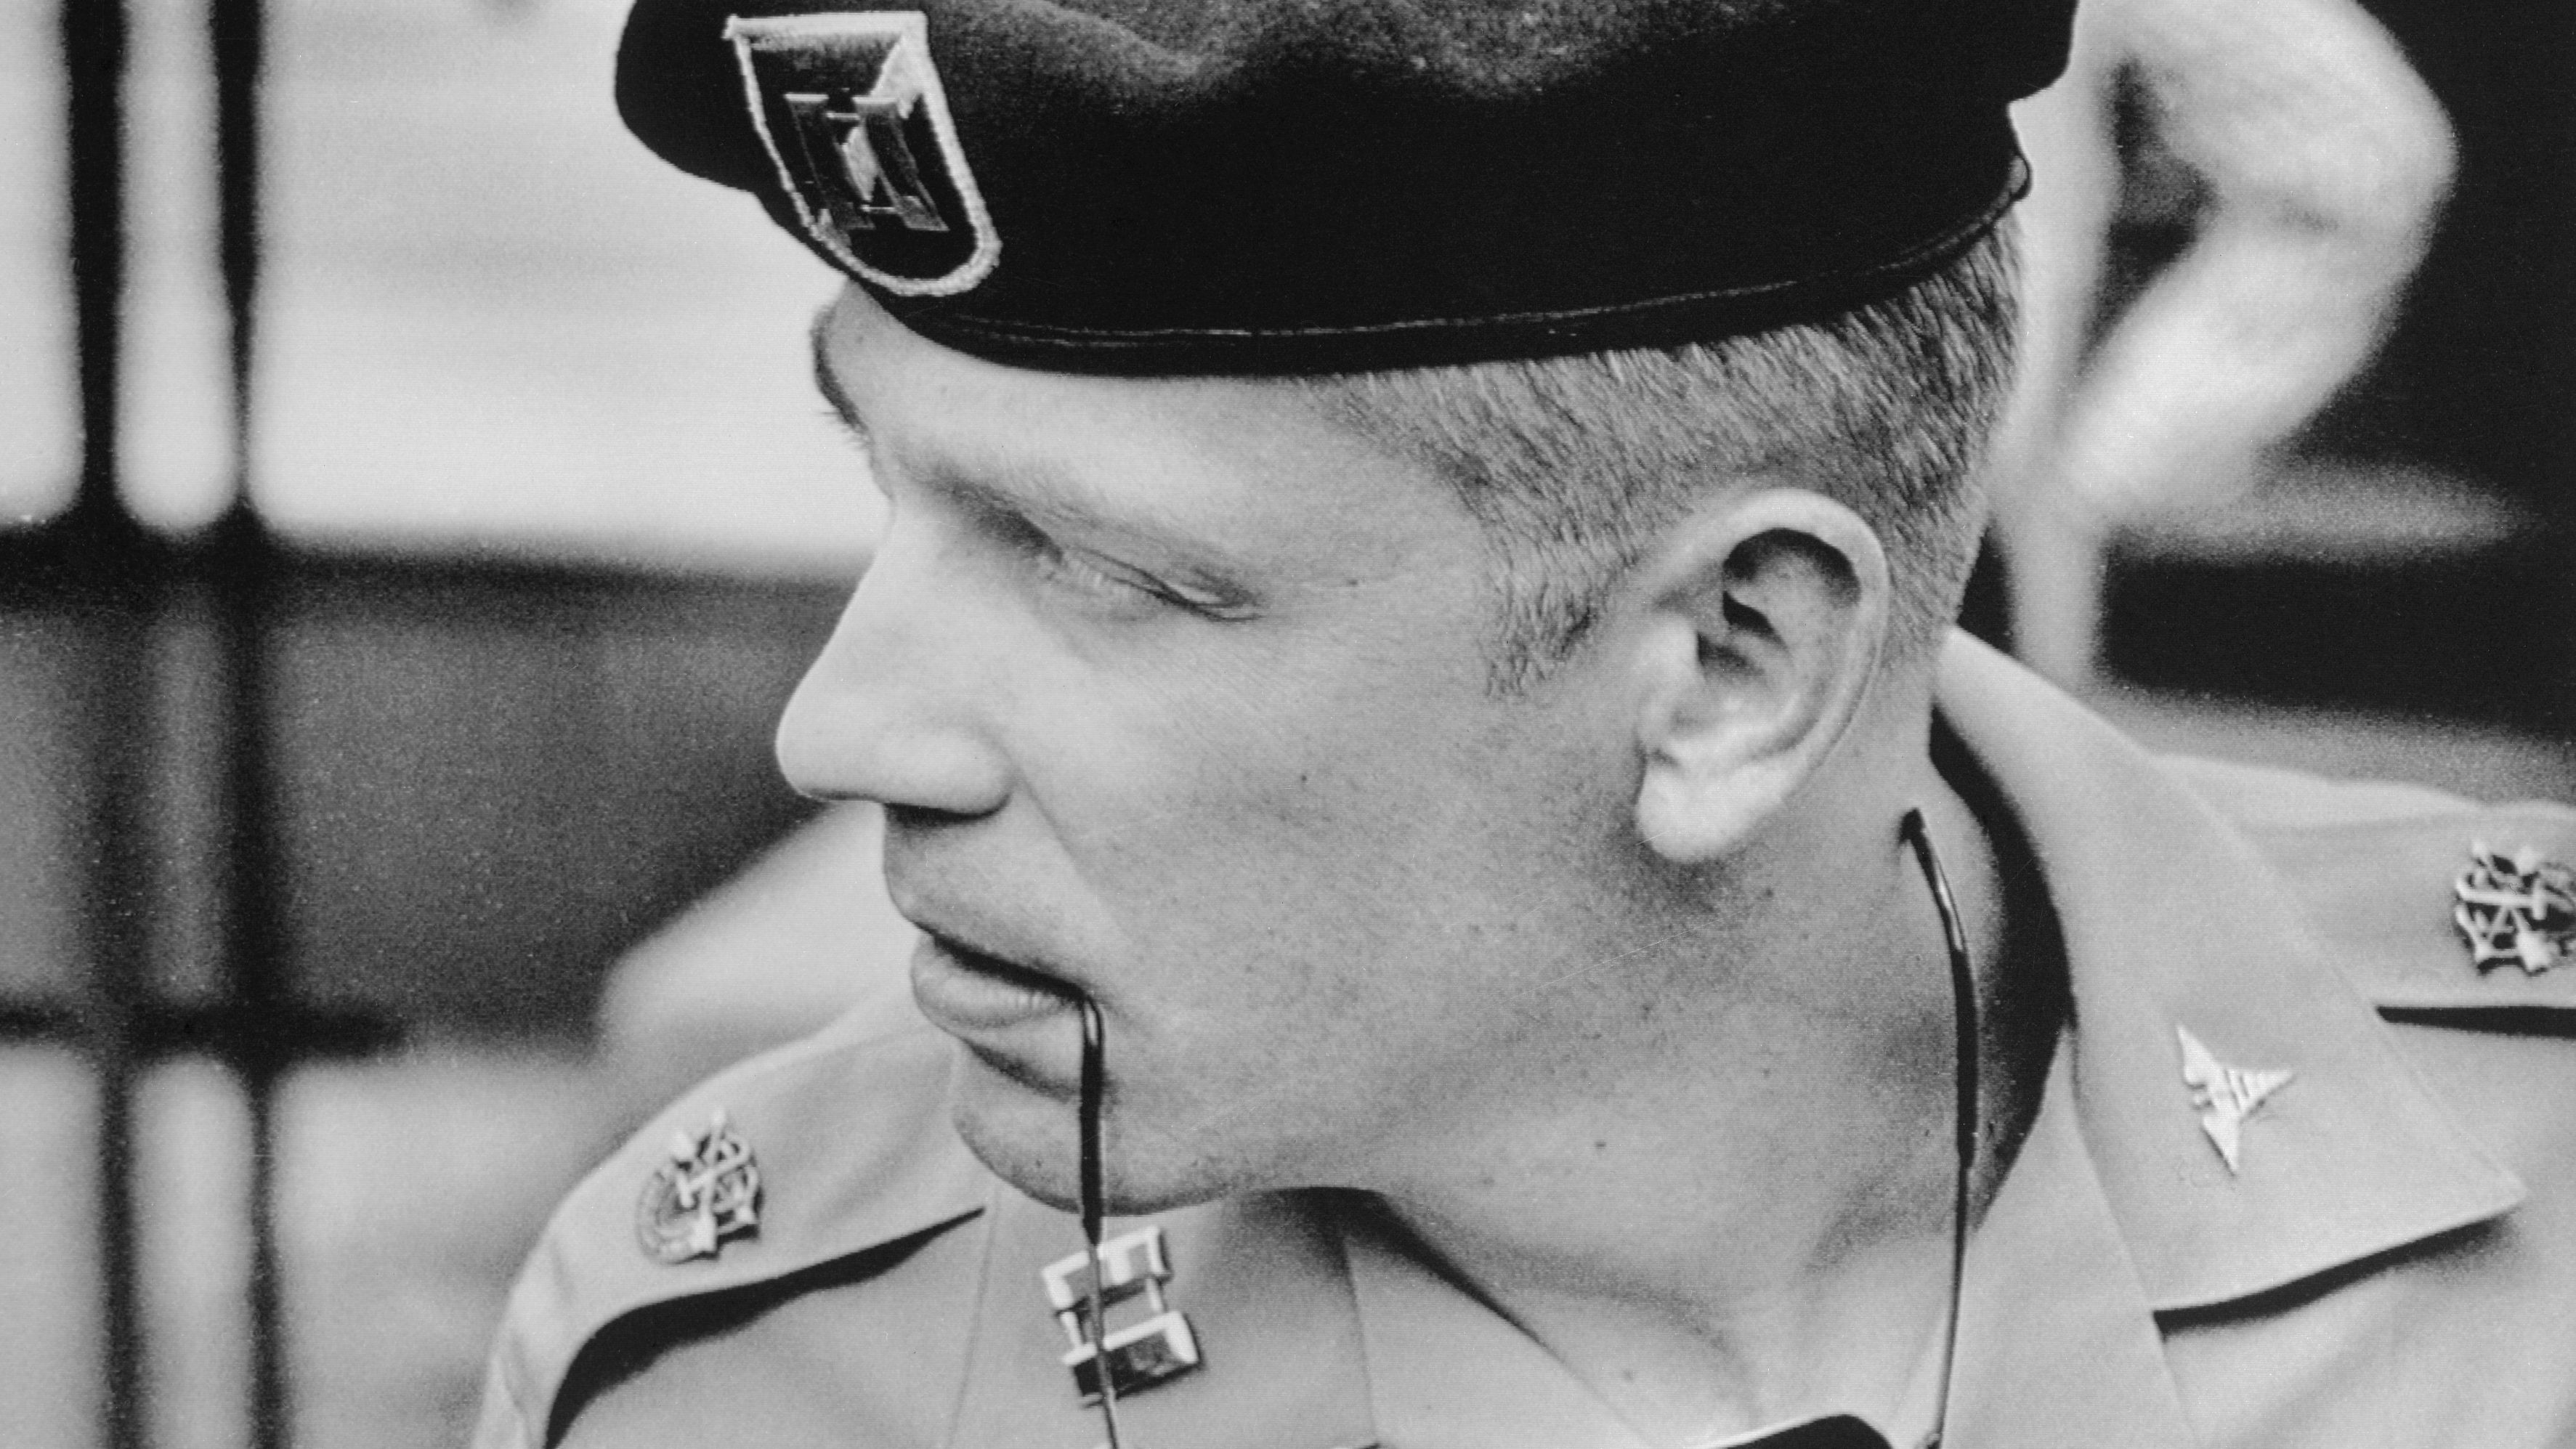 The Case of Convicted Killer Jeffrey MacDonald